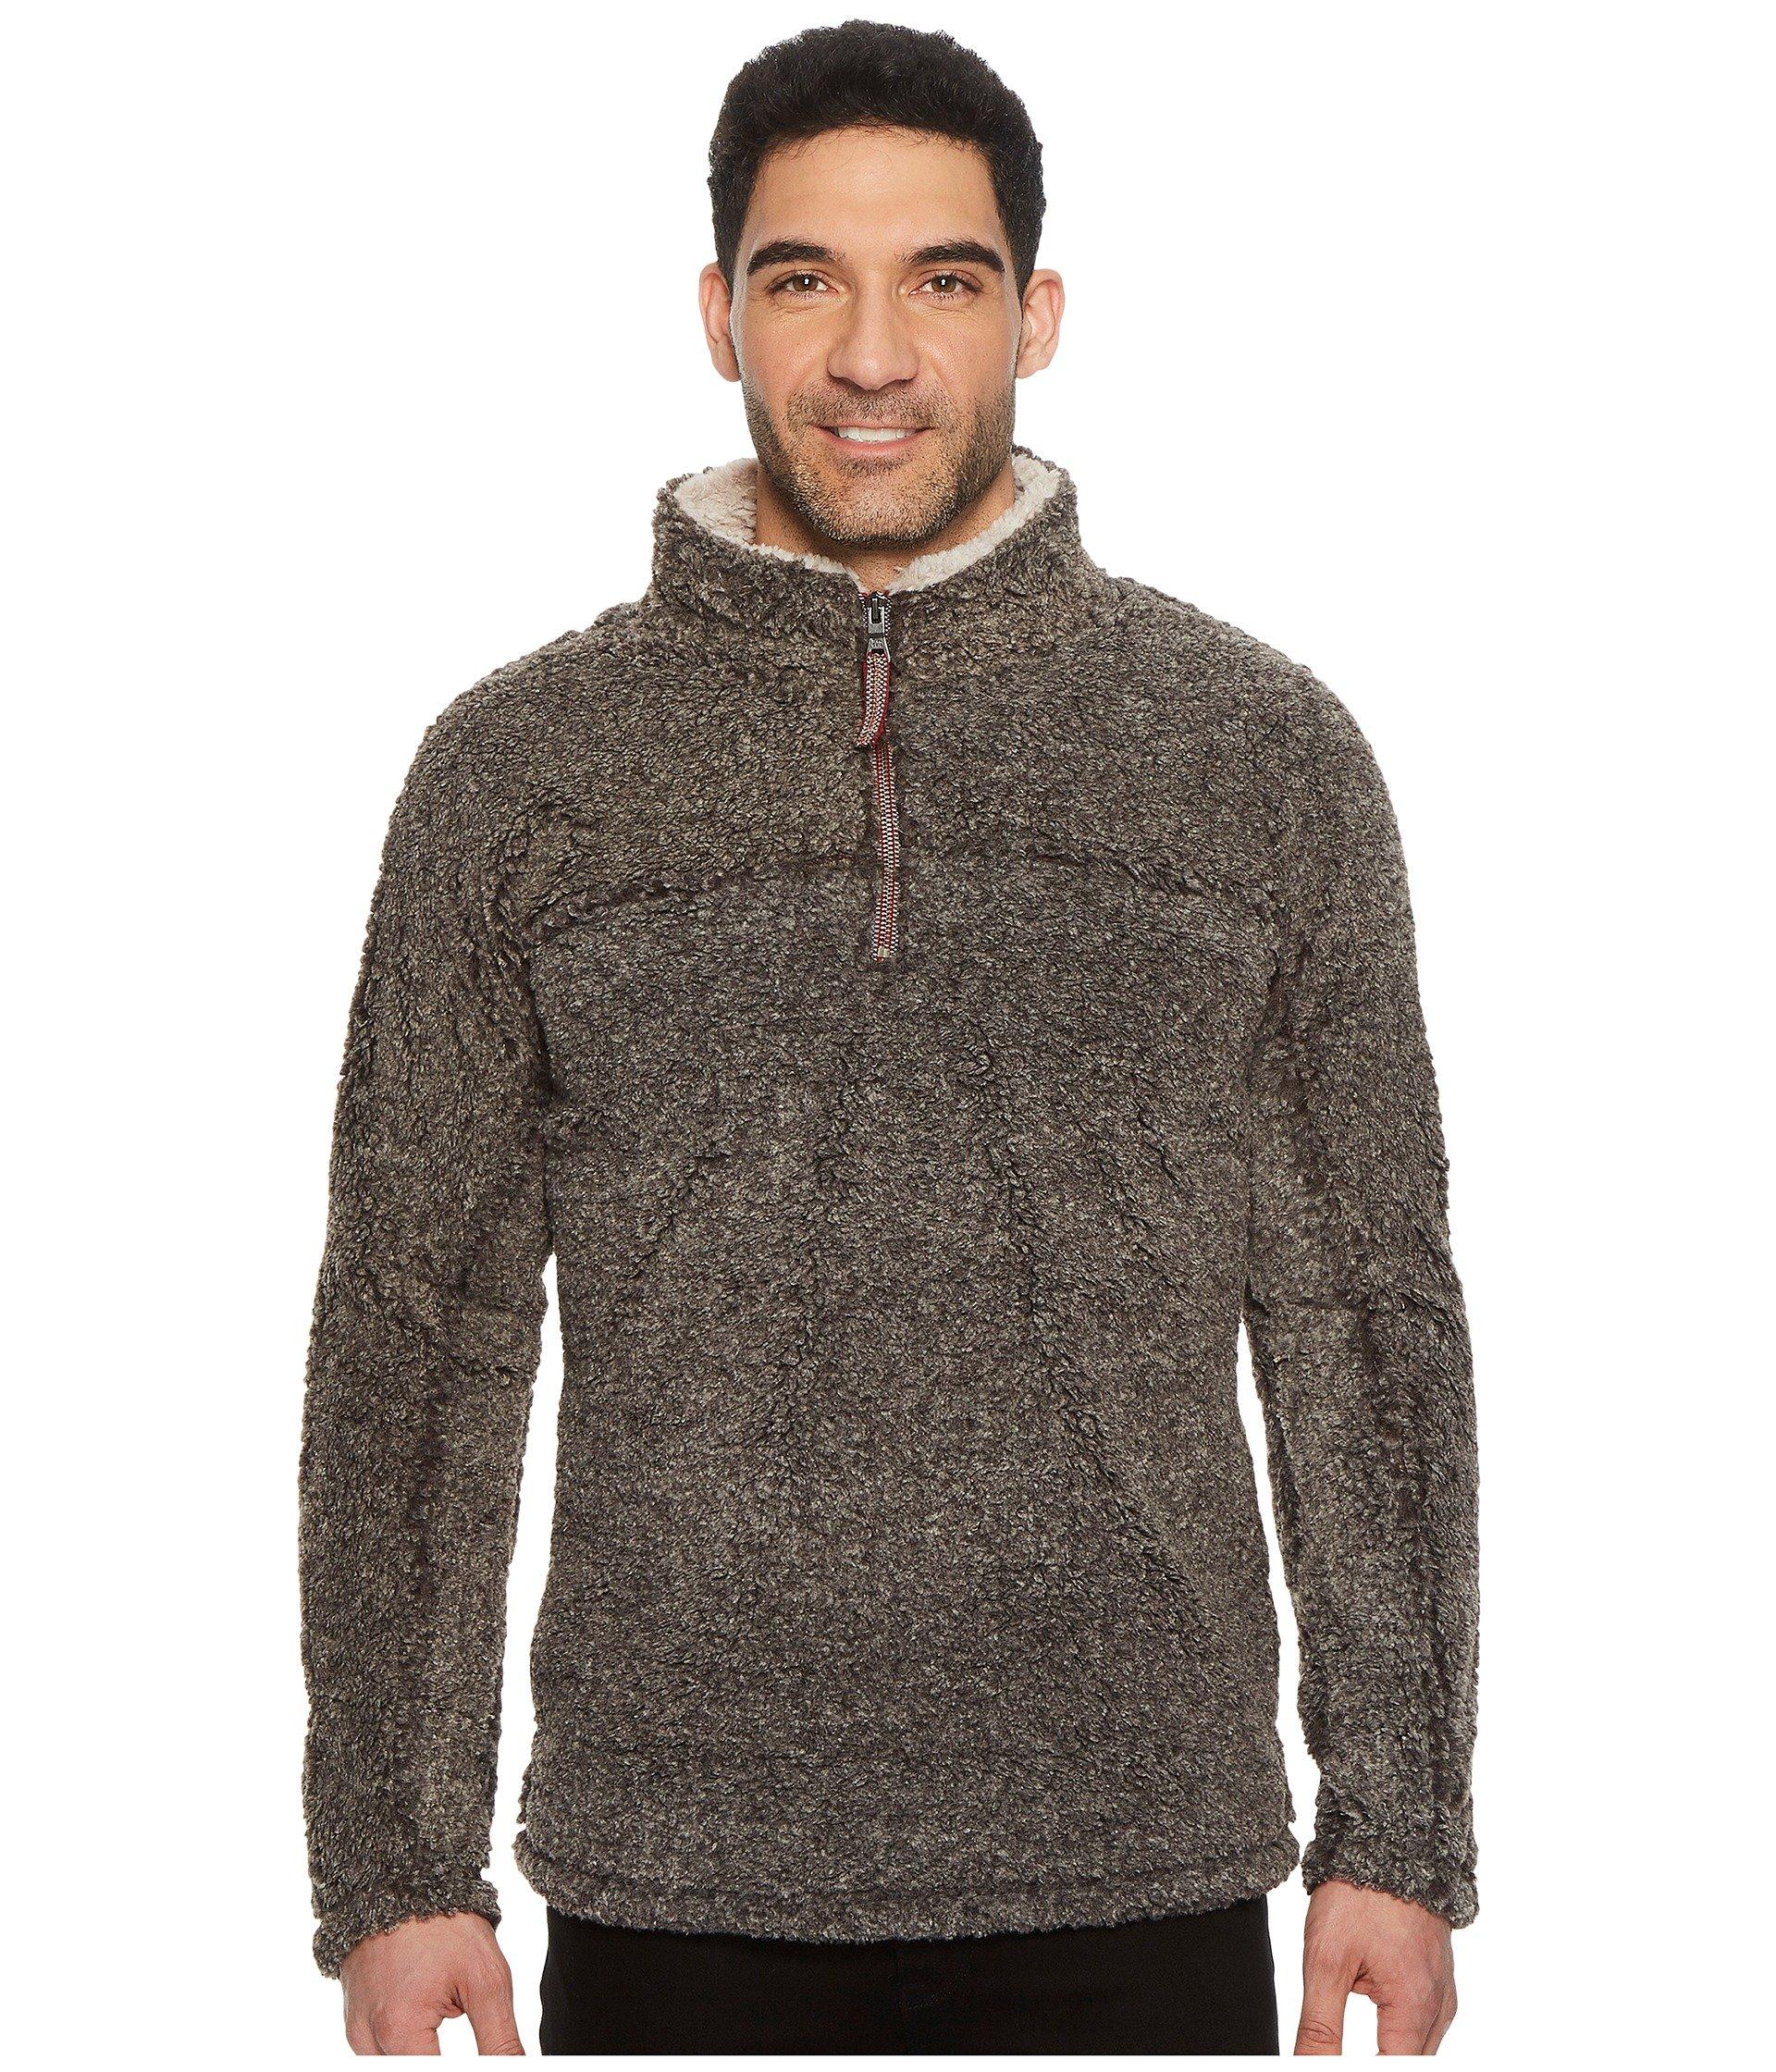 Zip 4 Shearling Charcoal Luxe True Pullover Grit Melange 1 xBqXq8Ytw